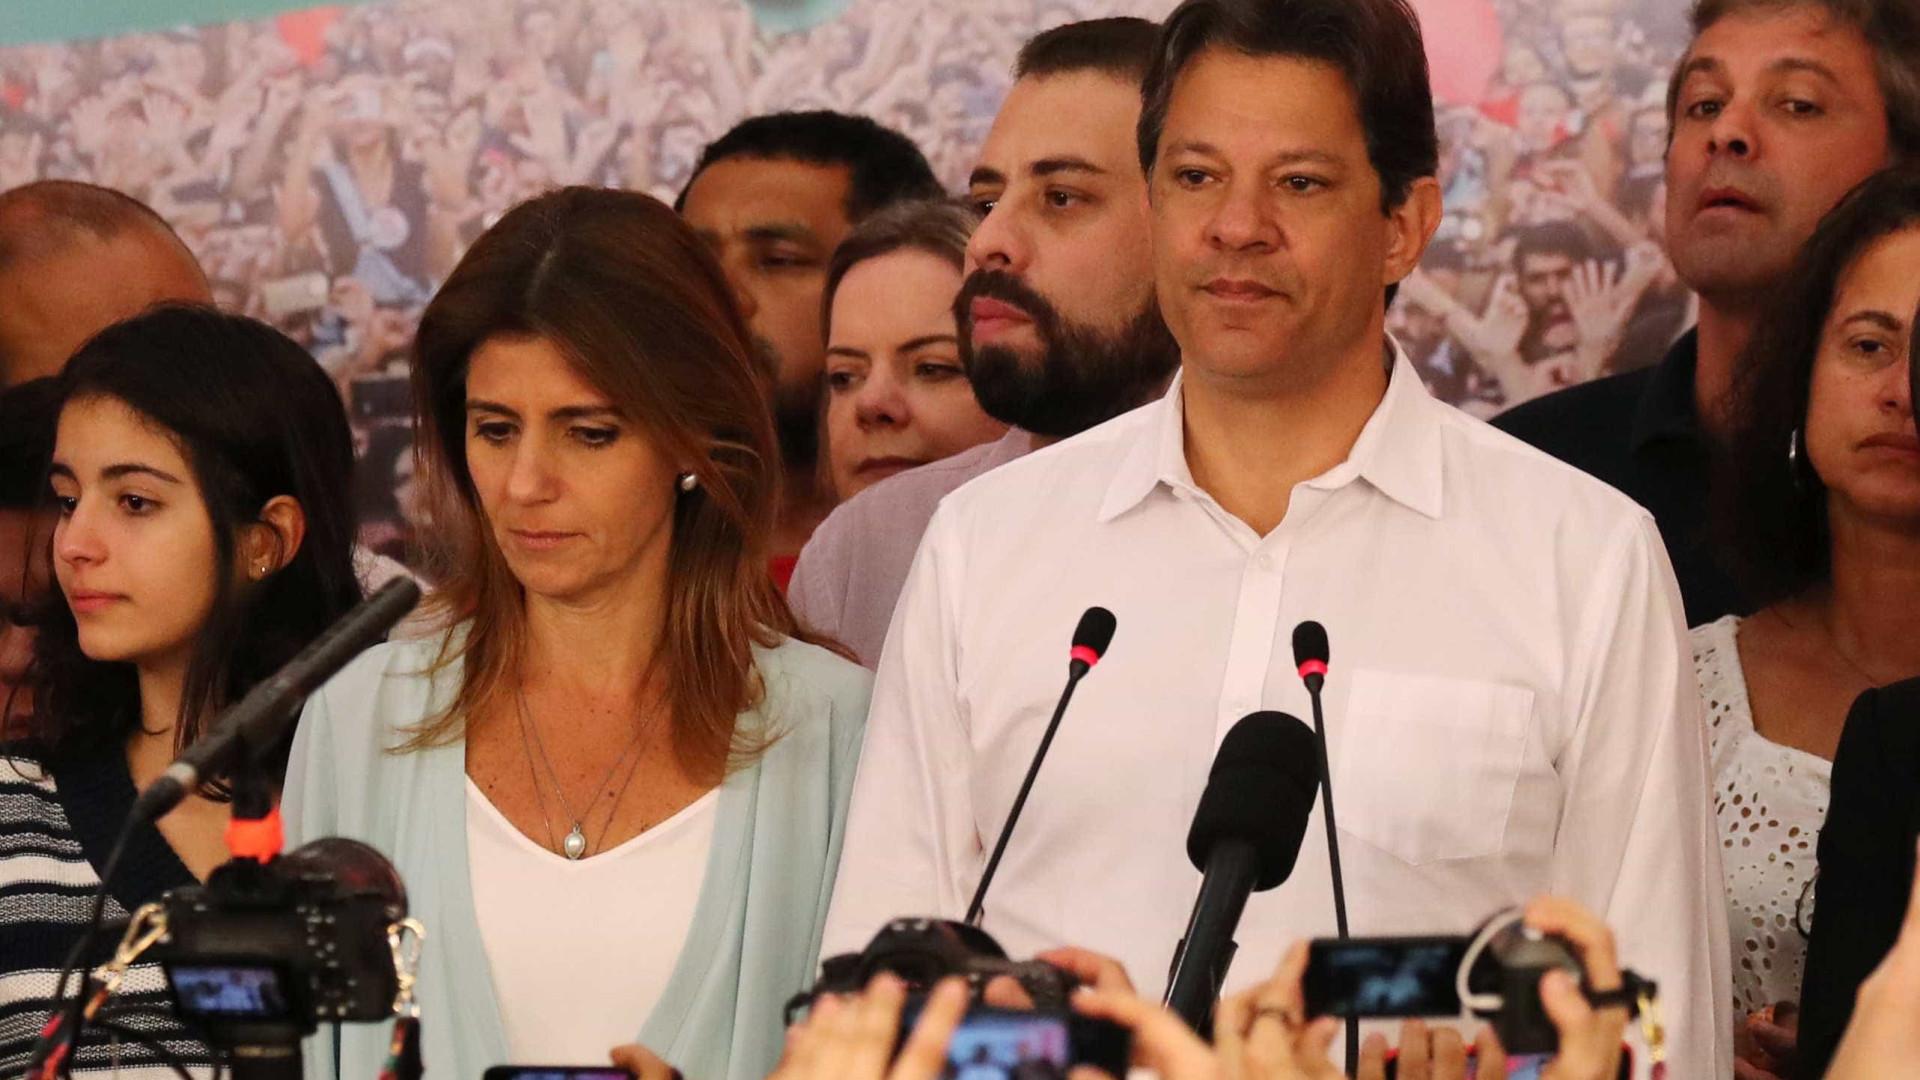 Após derrota, Haddad visitará Lula em Curitiba